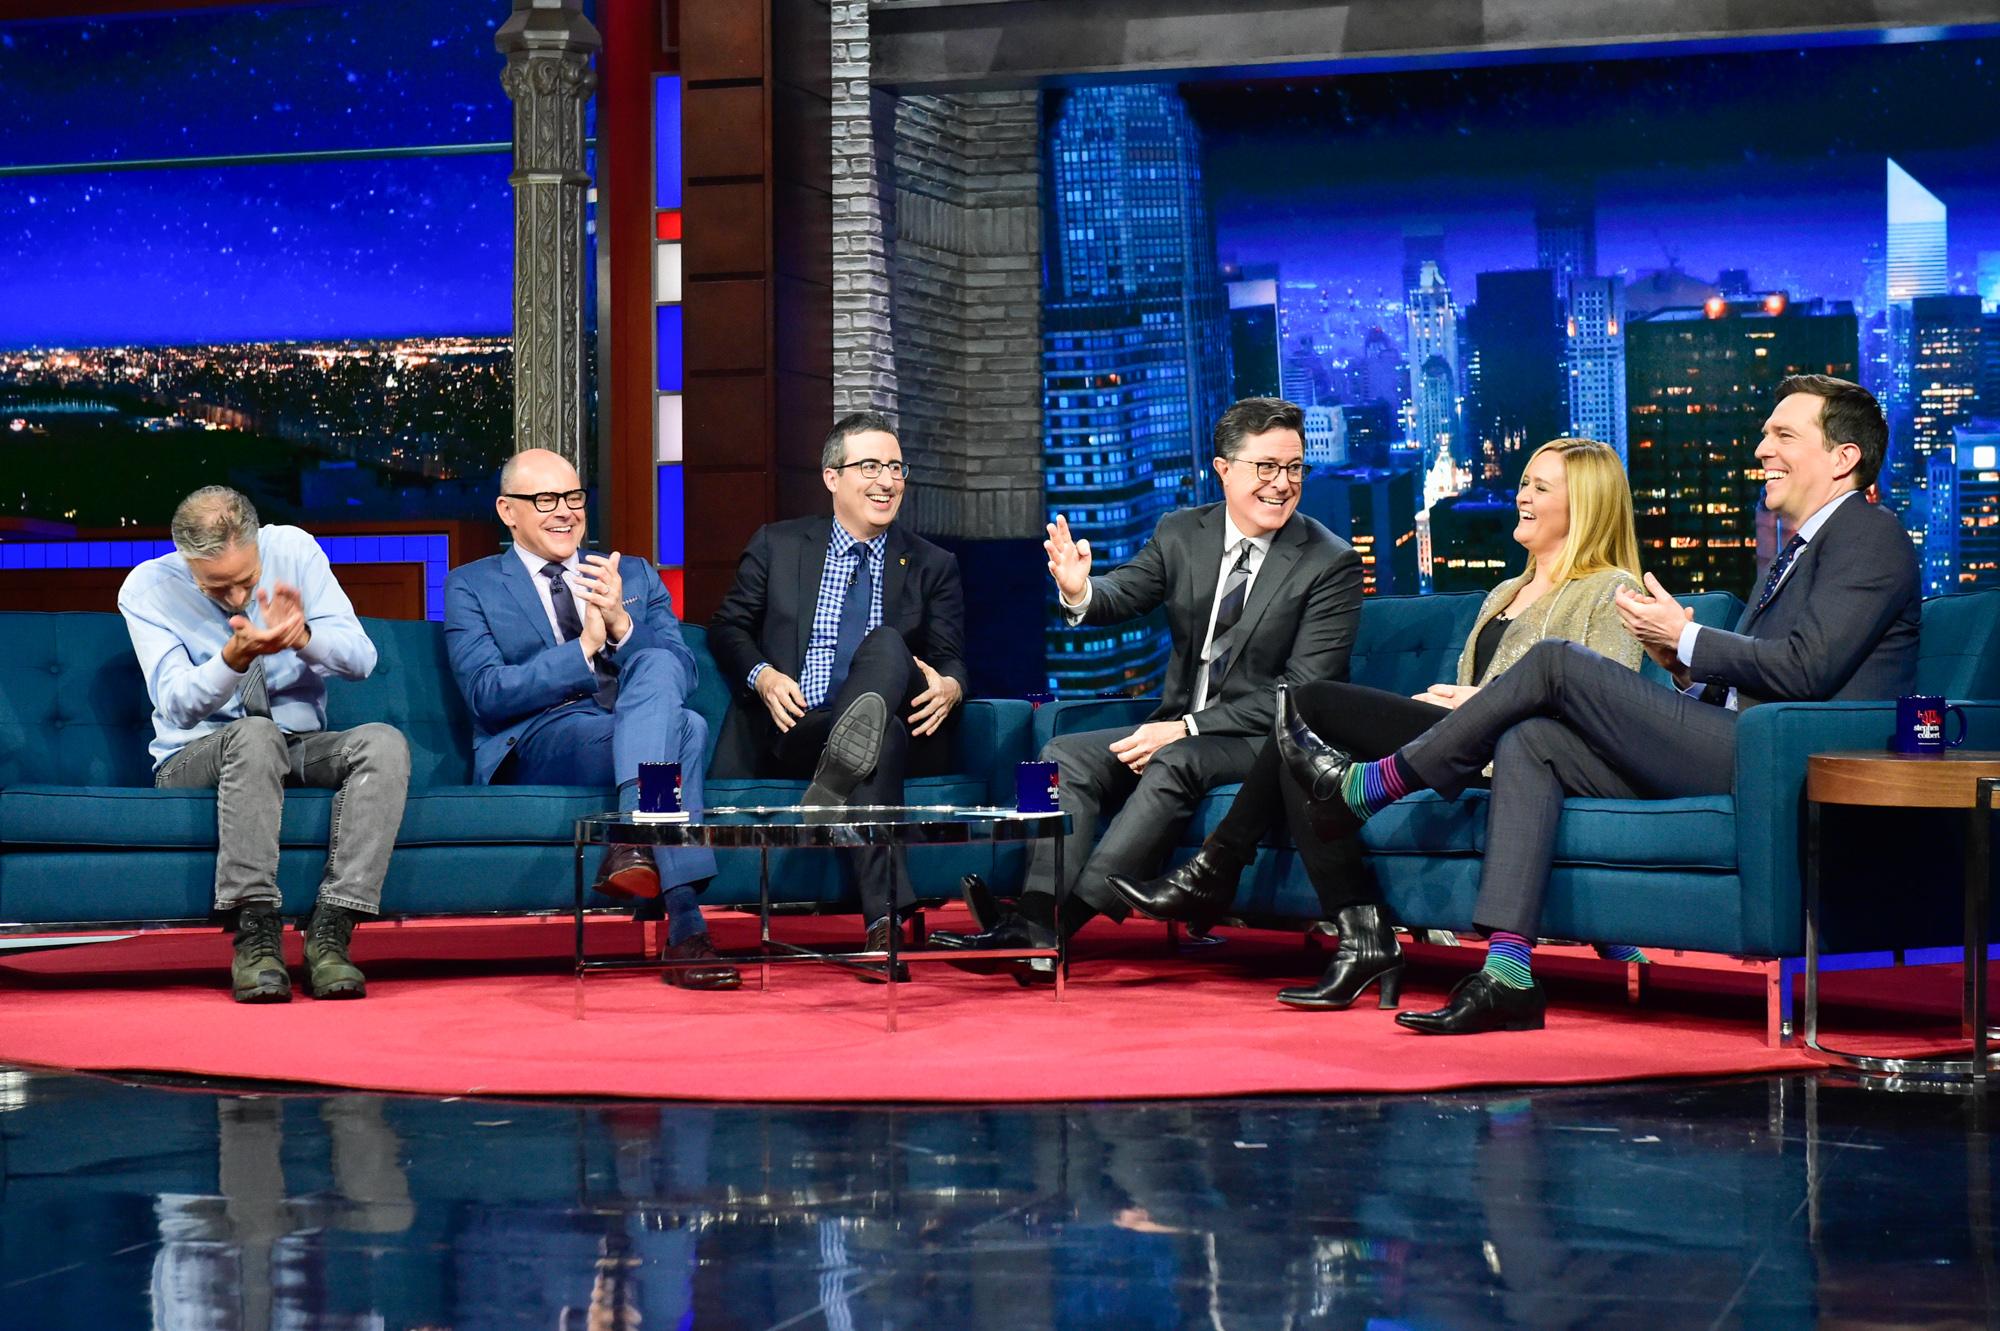 Jon, Rob, John, Stephen, Samantha, and Ed share a laugh.